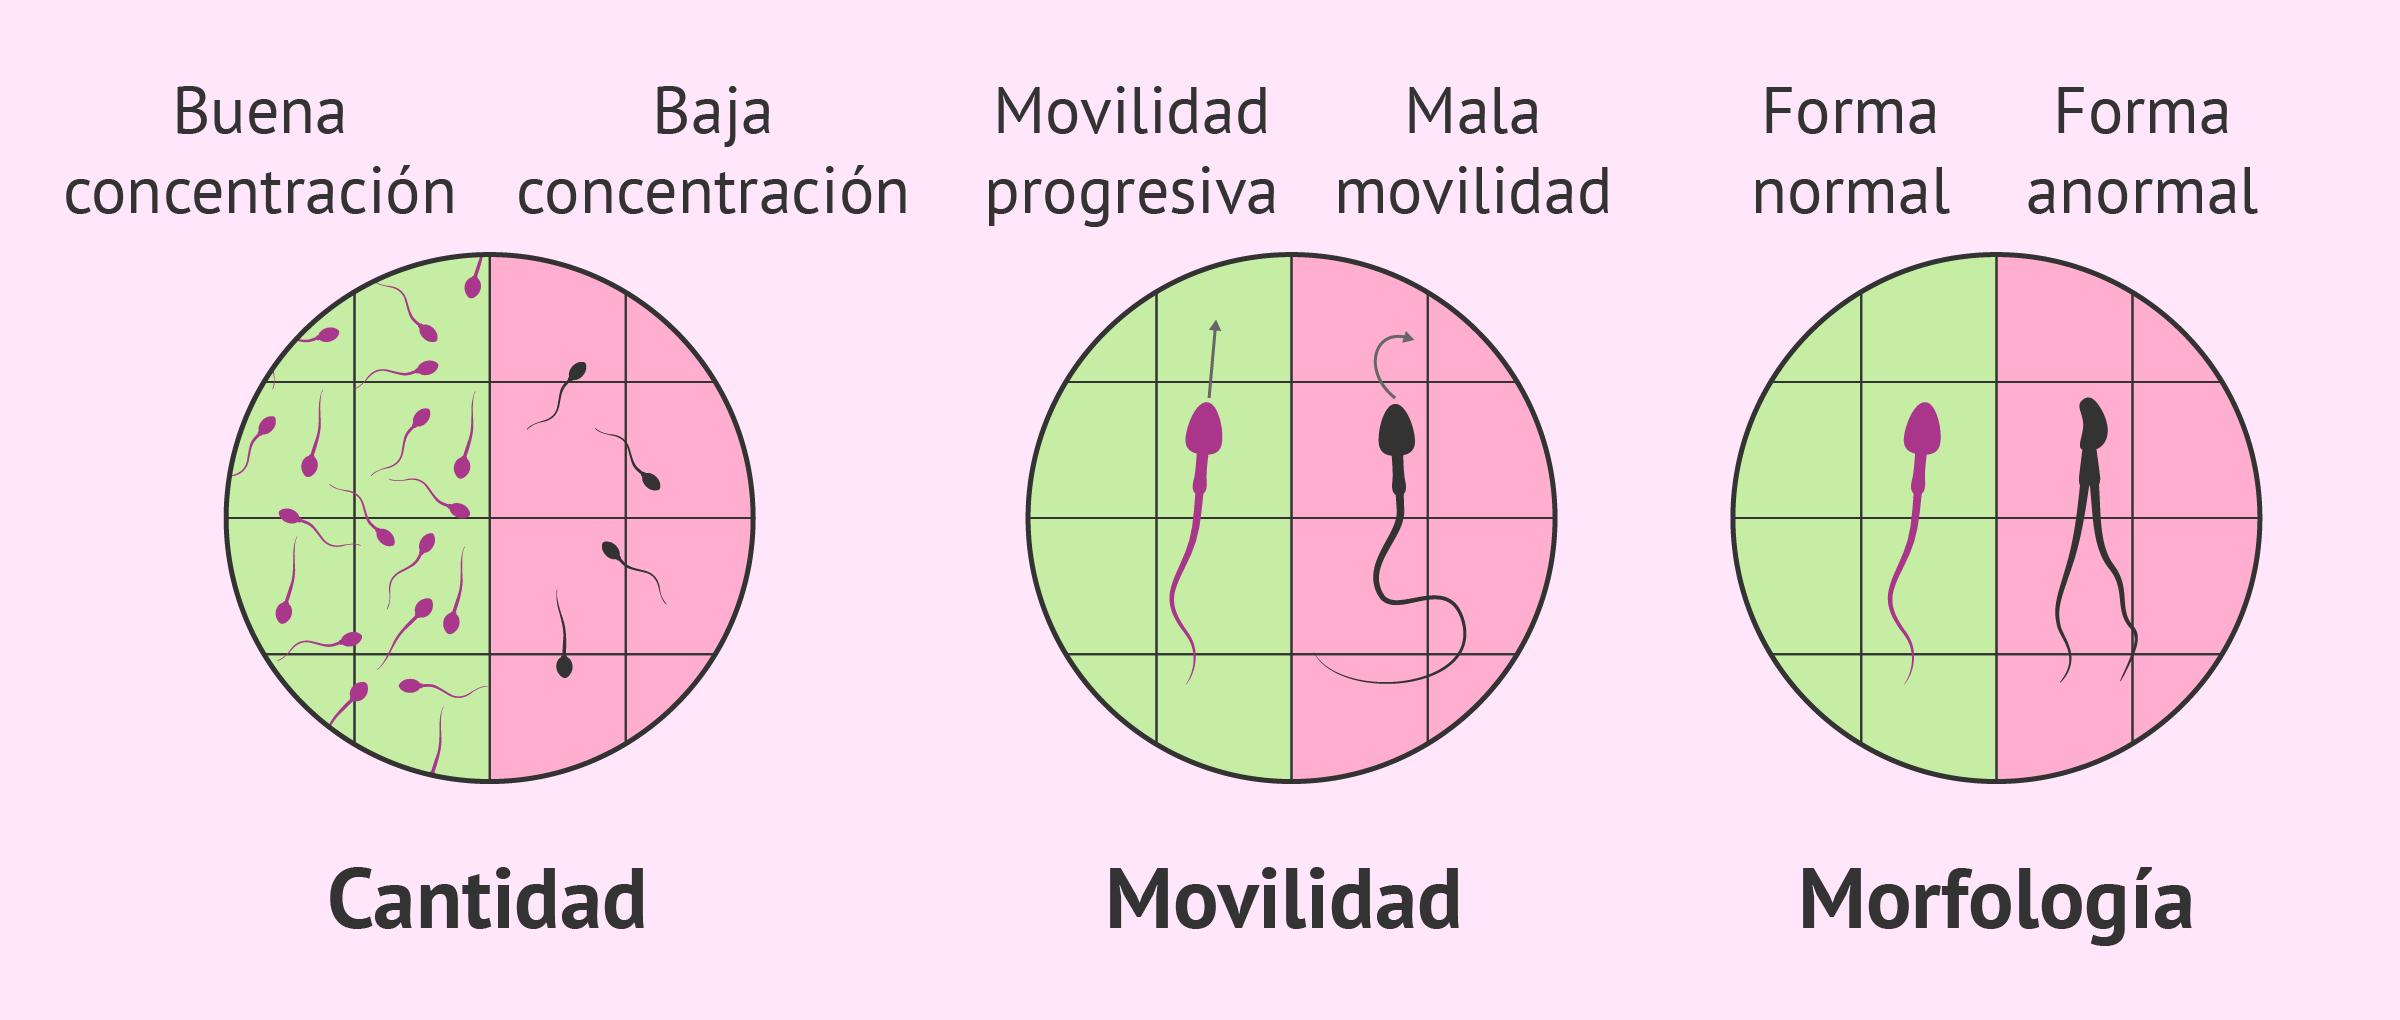 Factor espermático de esterilidad masculina